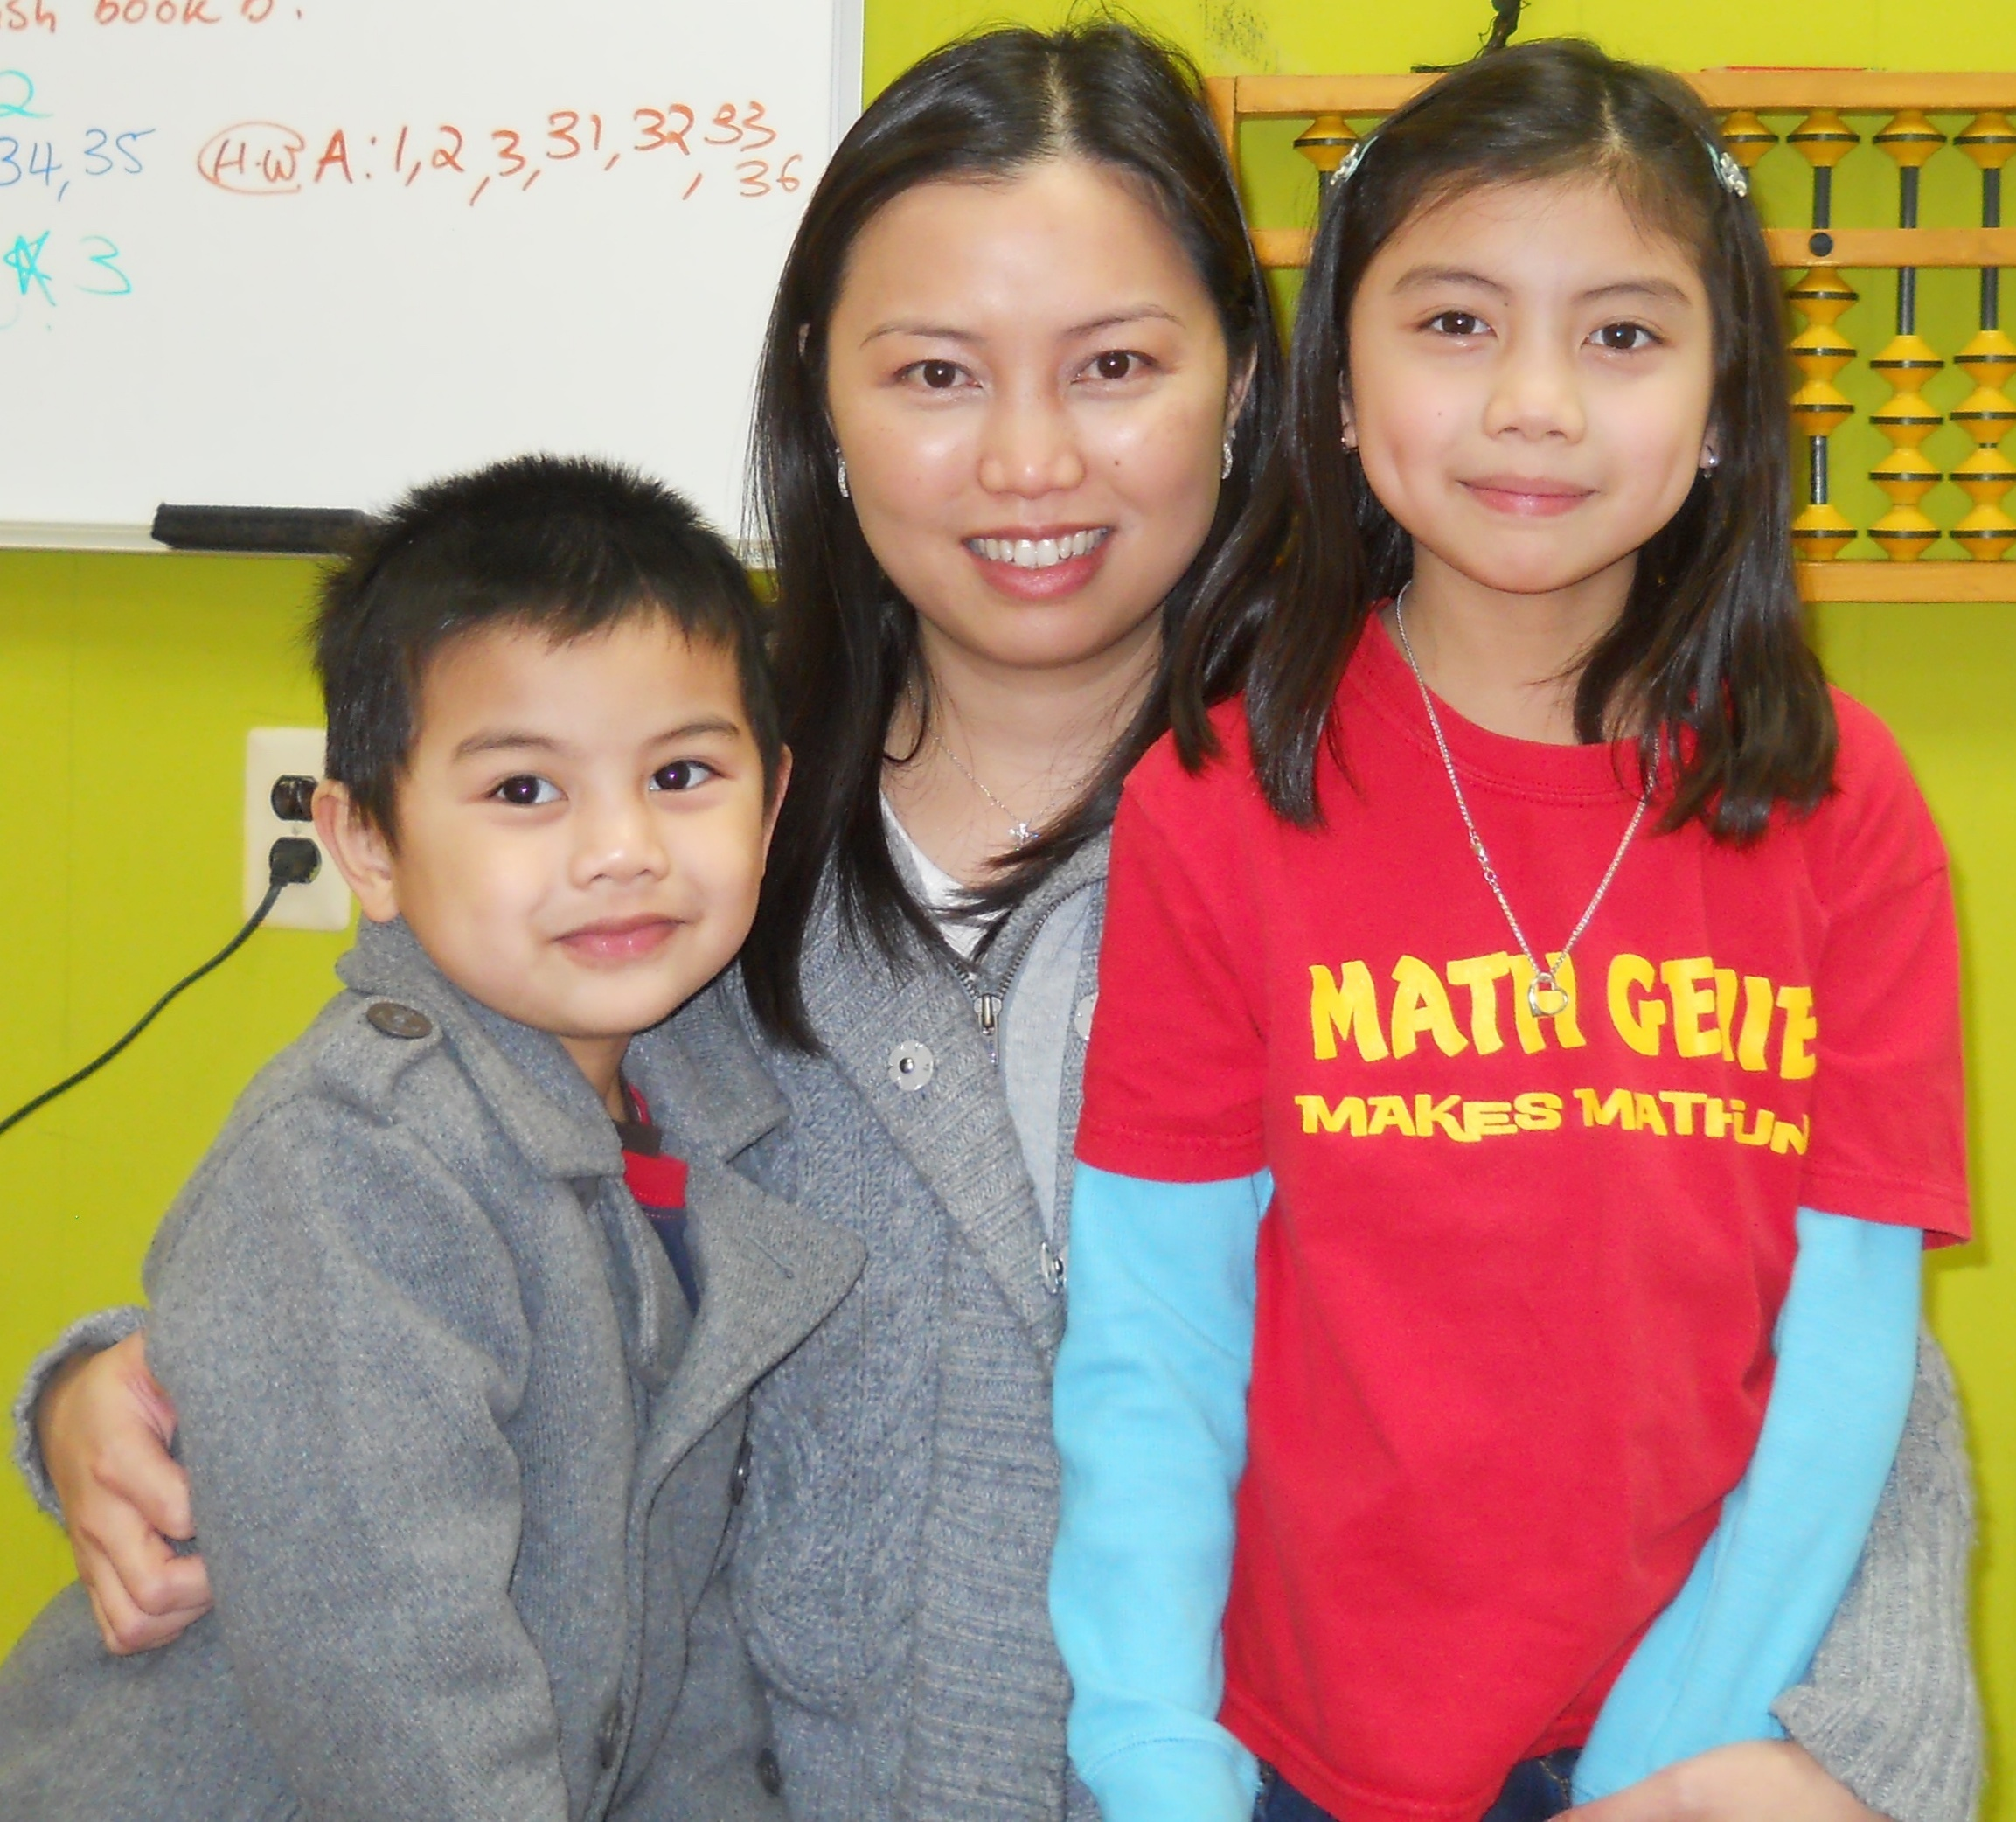 Math Genie Success- students teacher is shocked at Math Genie students extraordinary math skills